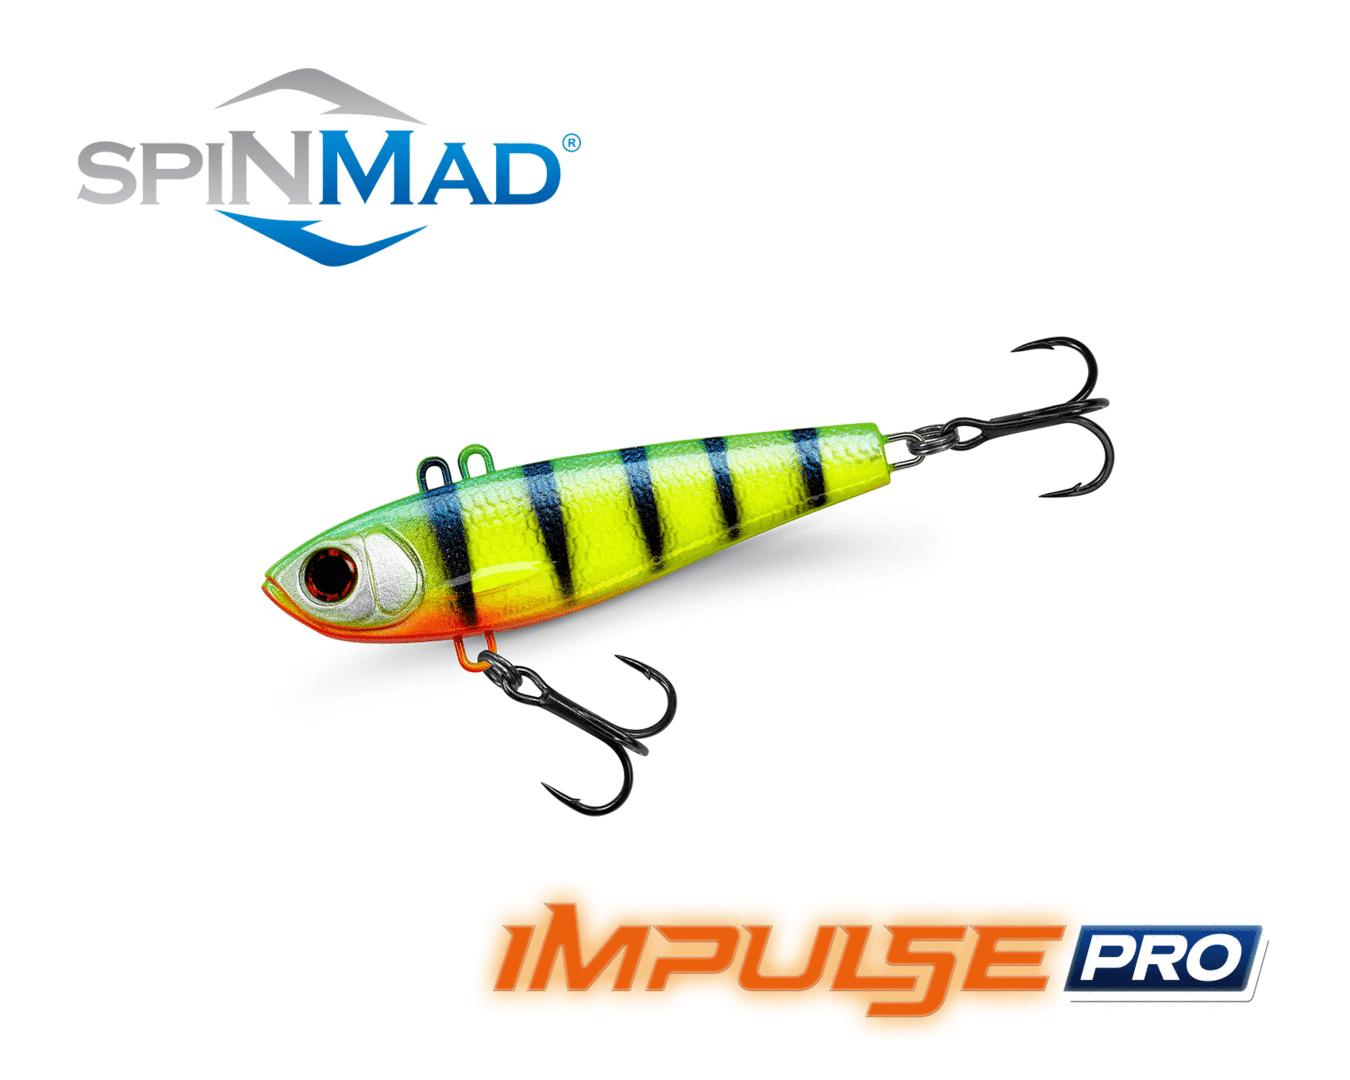 Spinmad Impulse Pro 2807